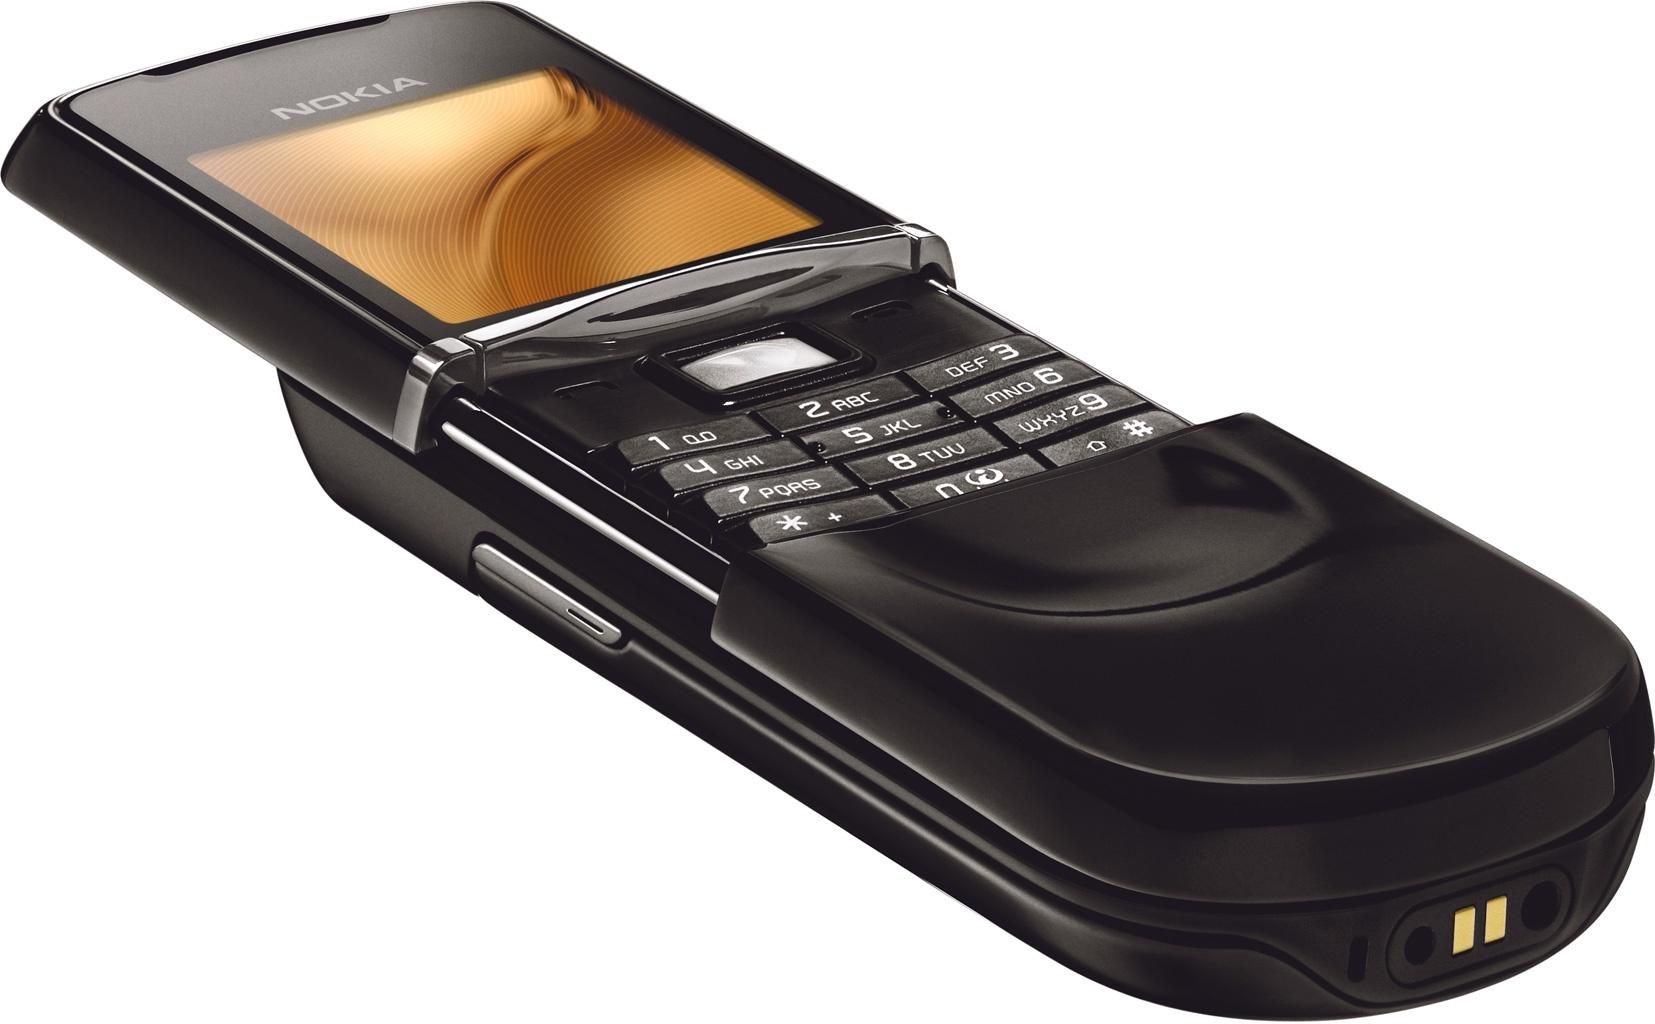 Tapety : Nokia 8800 Sirocco Edition